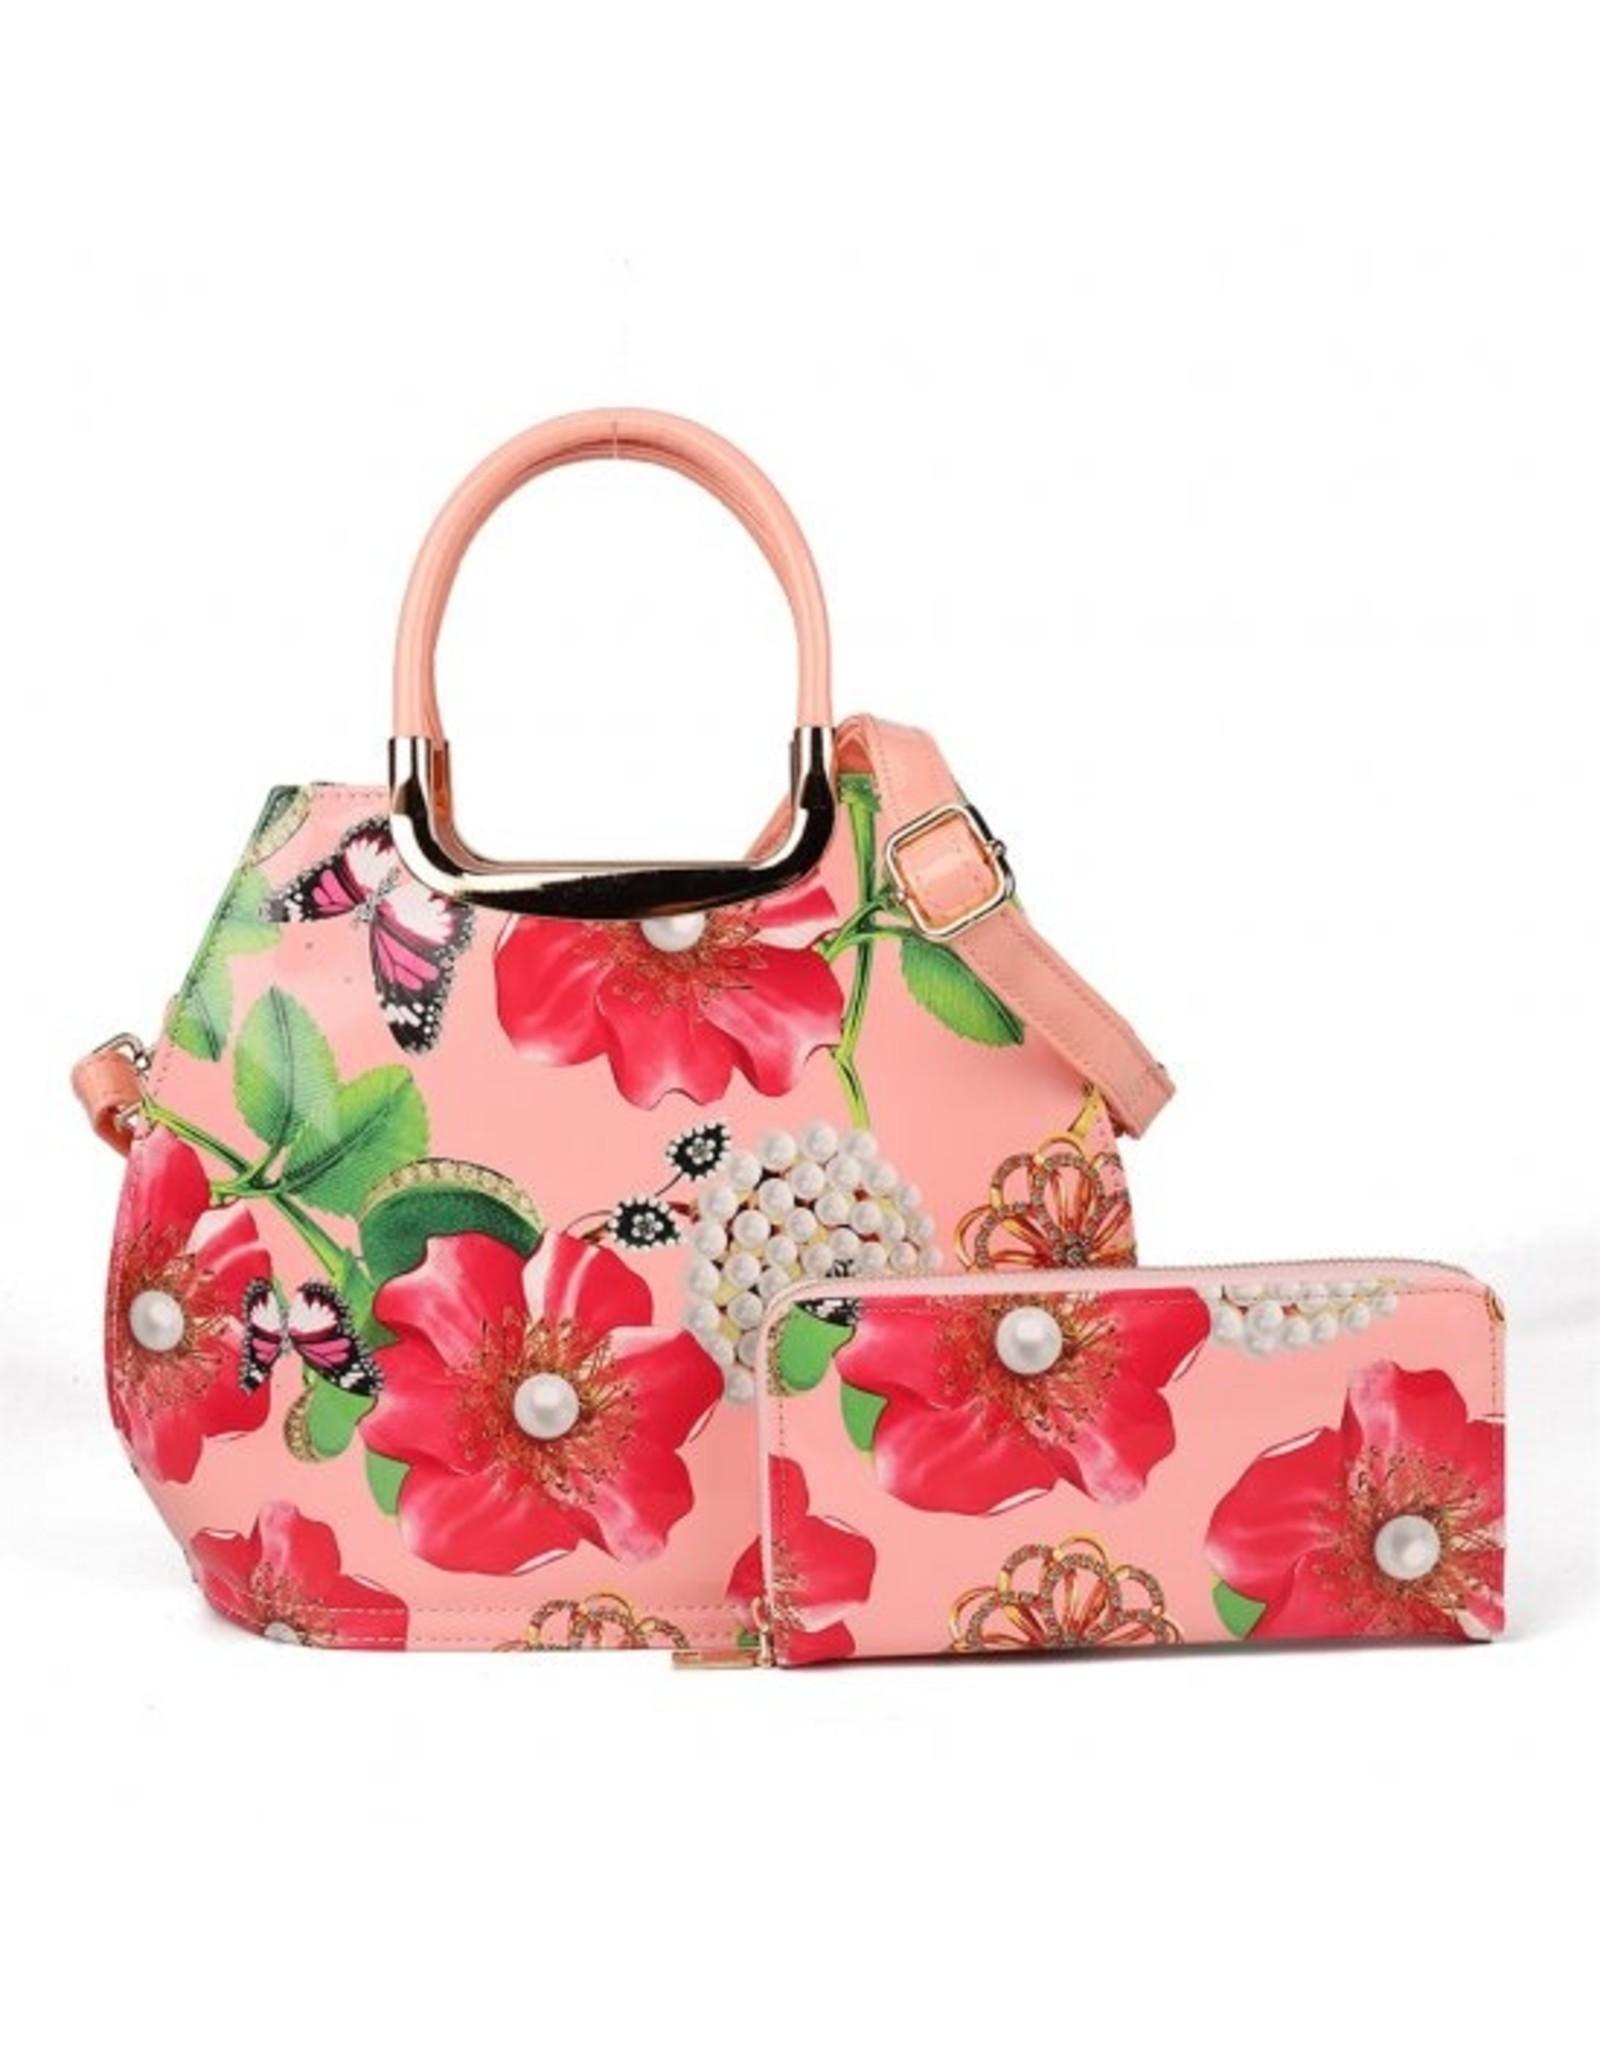 Trukado Fashion bags - Handbag with flowers Poppies & Pearls pink